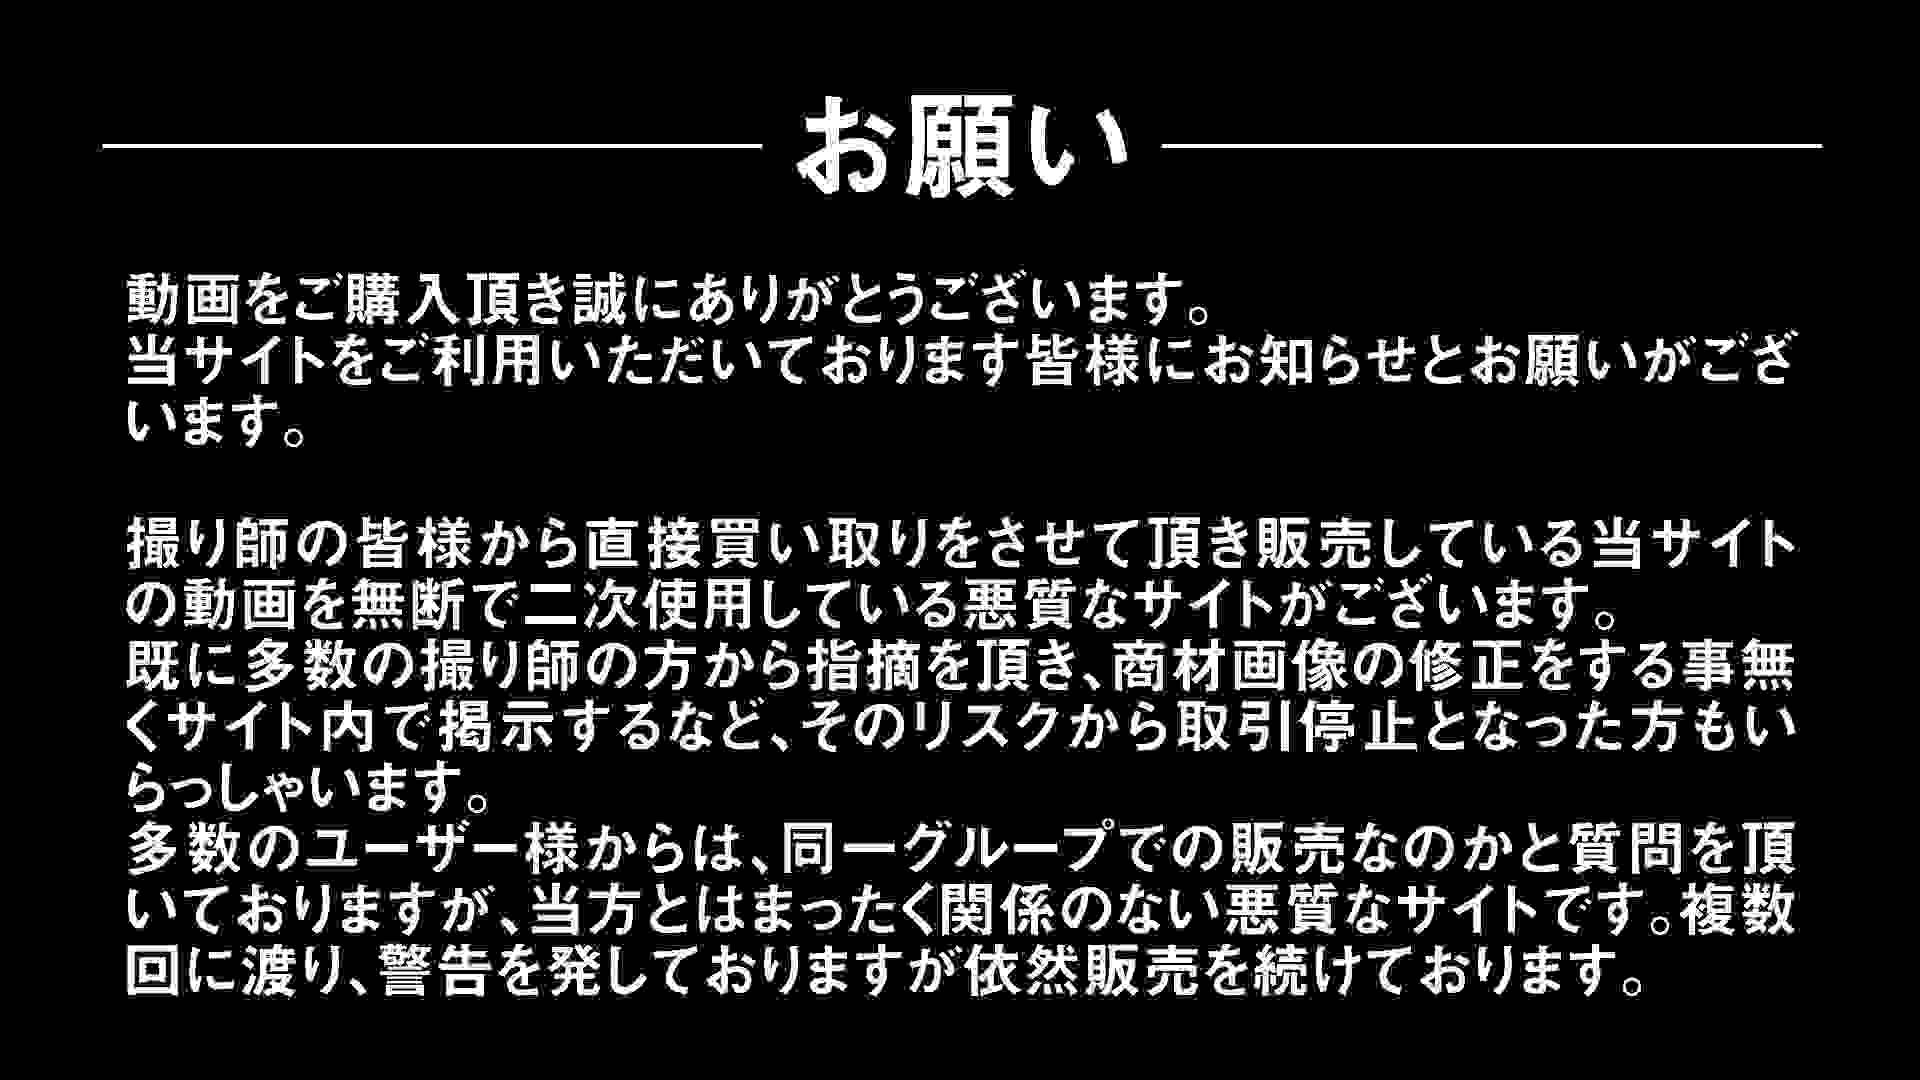 Aquaな露天風呂Vol.300 盗撮  83連発 3